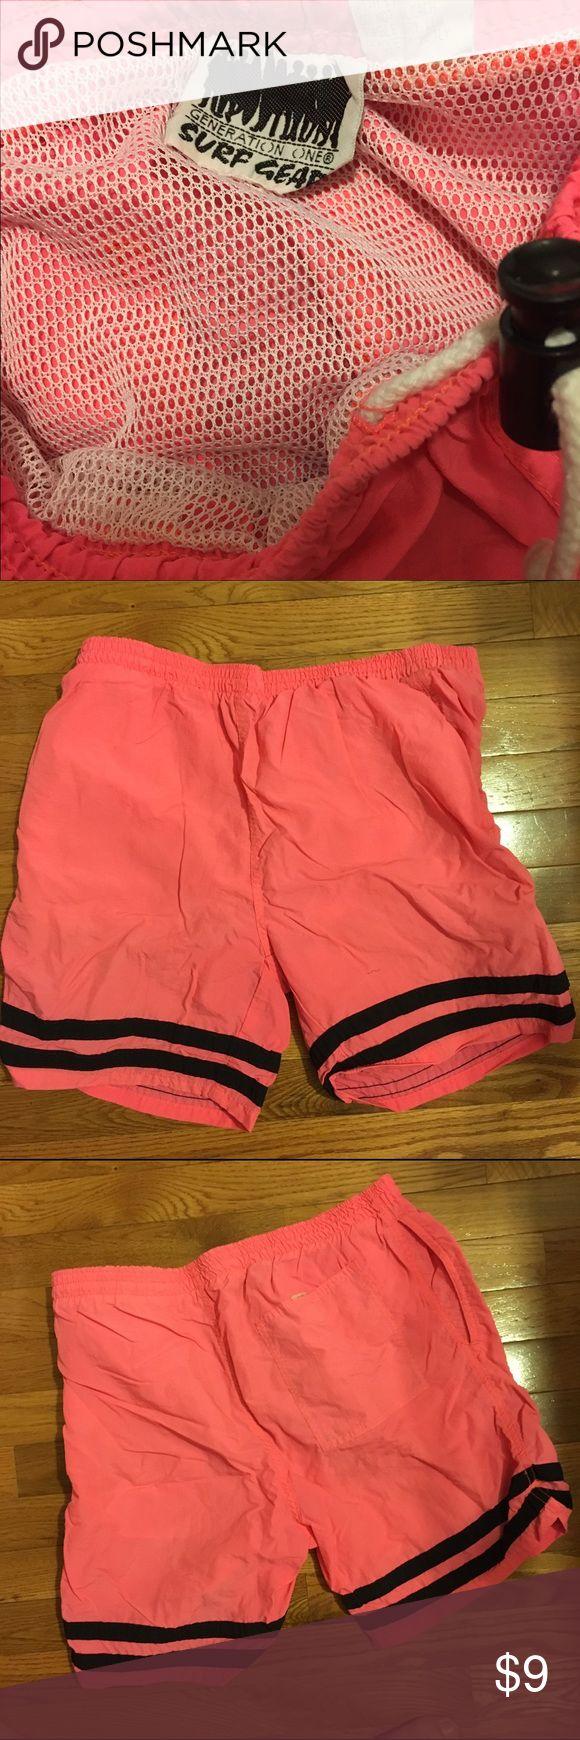 Generation One - Surf Gear - Men's Swim Trunks Super cool retro surf trunks. Mesh inner lining, neon pink with black stripes. Swim Swim Trunks